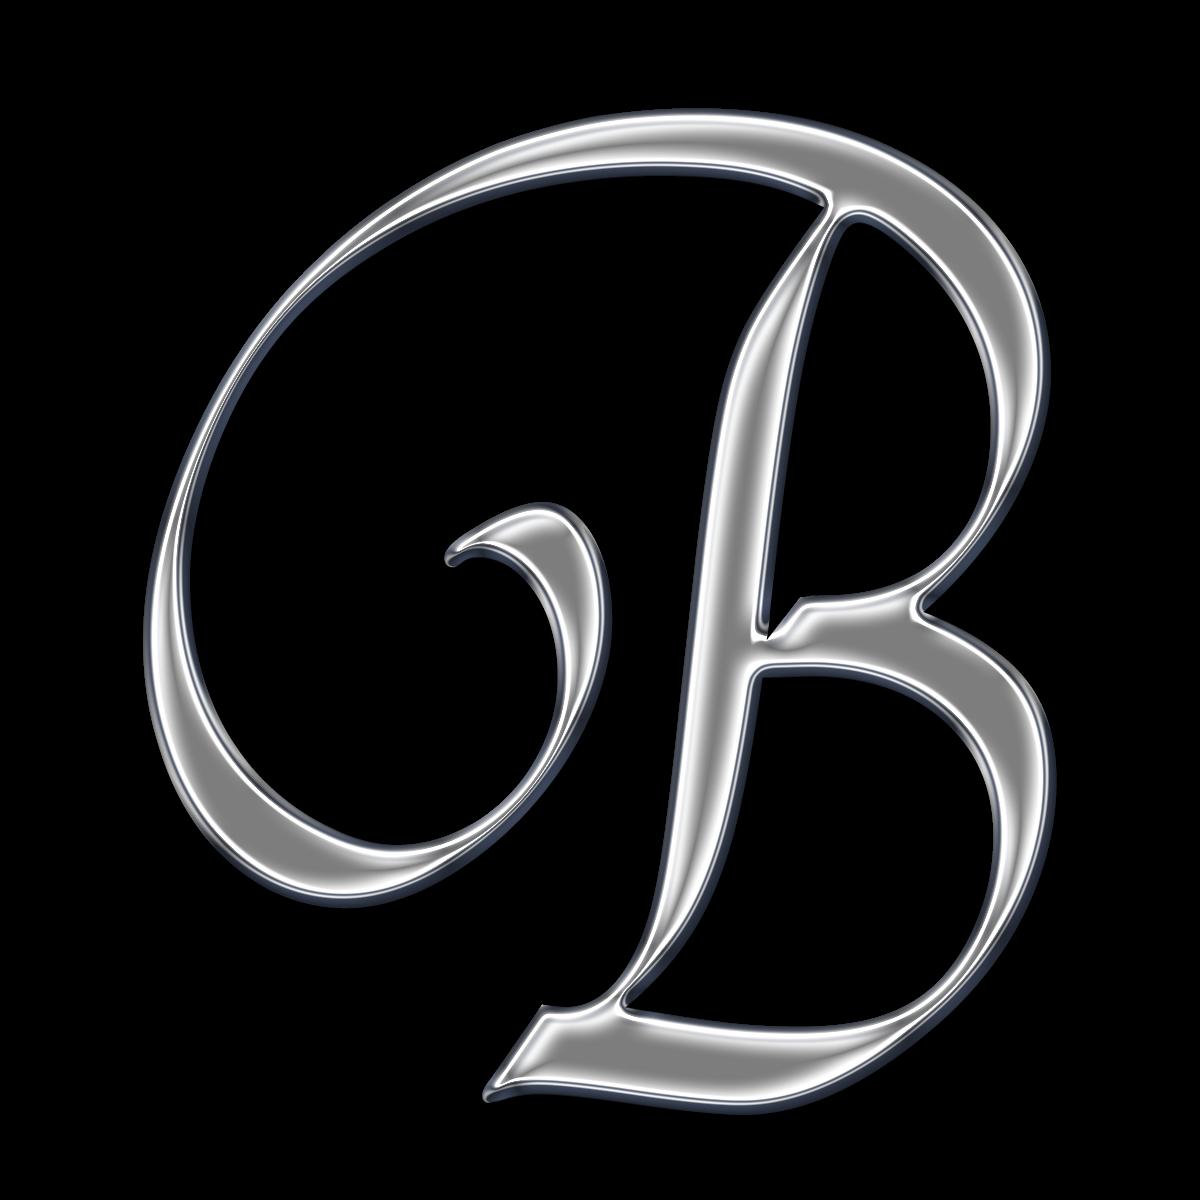 CAPITALLETTERBFREEALPHA.png (1200×1200) Lettering